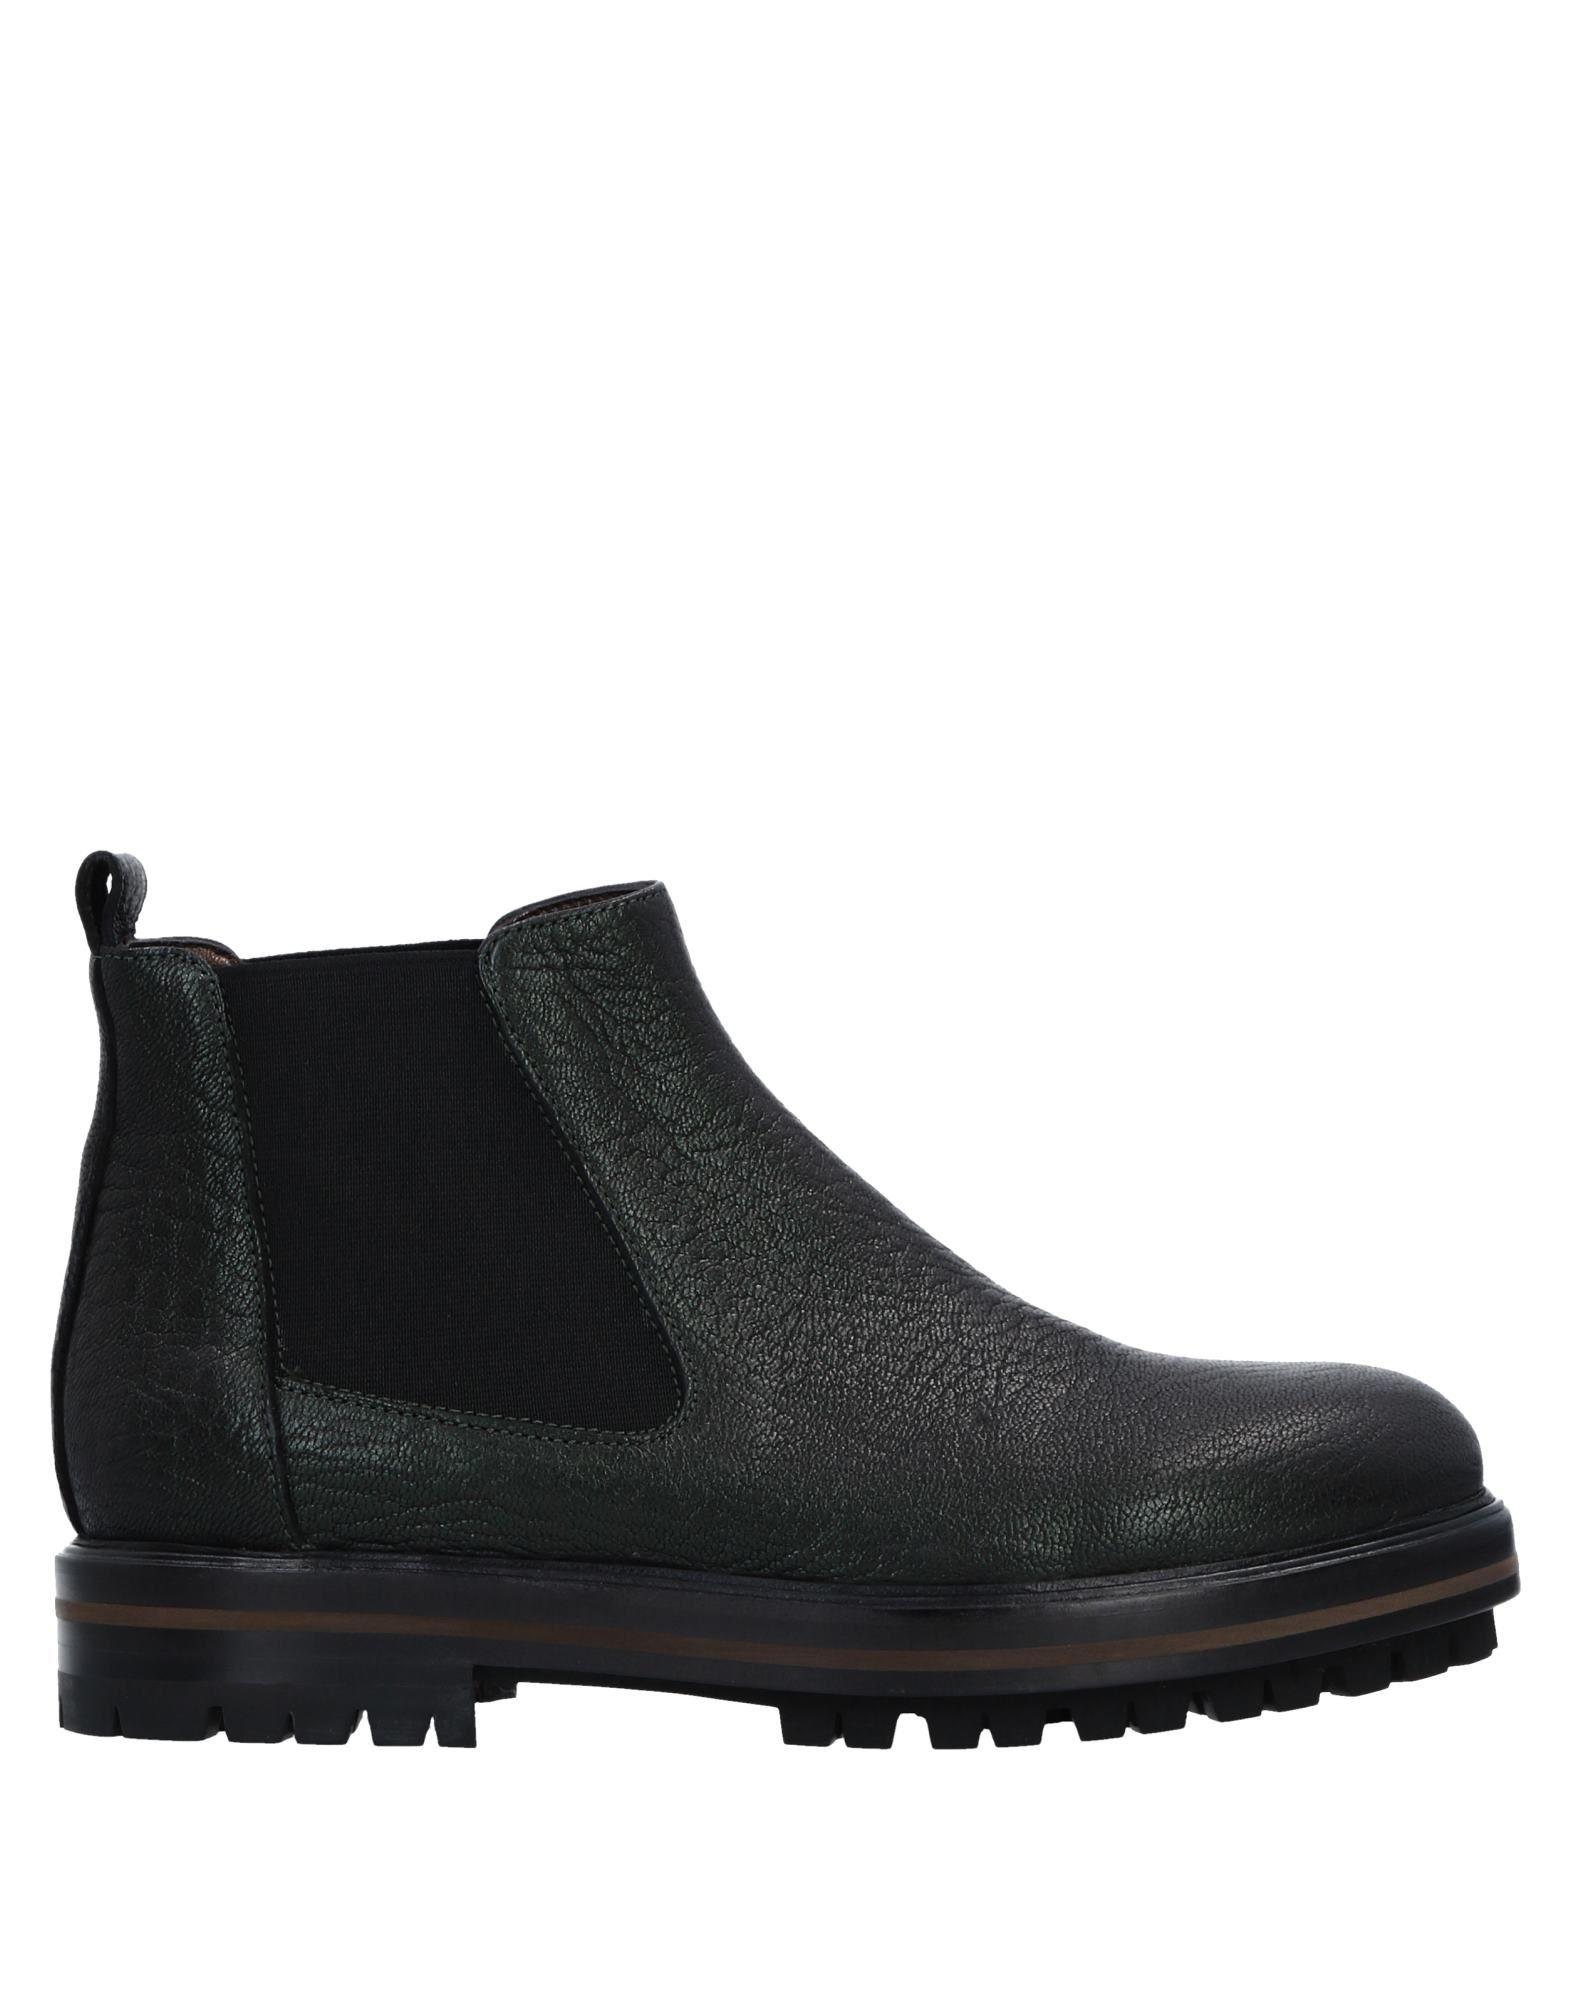 Rabatt Schuhe Agl Attilio  Giusti Leombruni Chelsea Stiefel Damen  Attilio 11539992UF f60efb